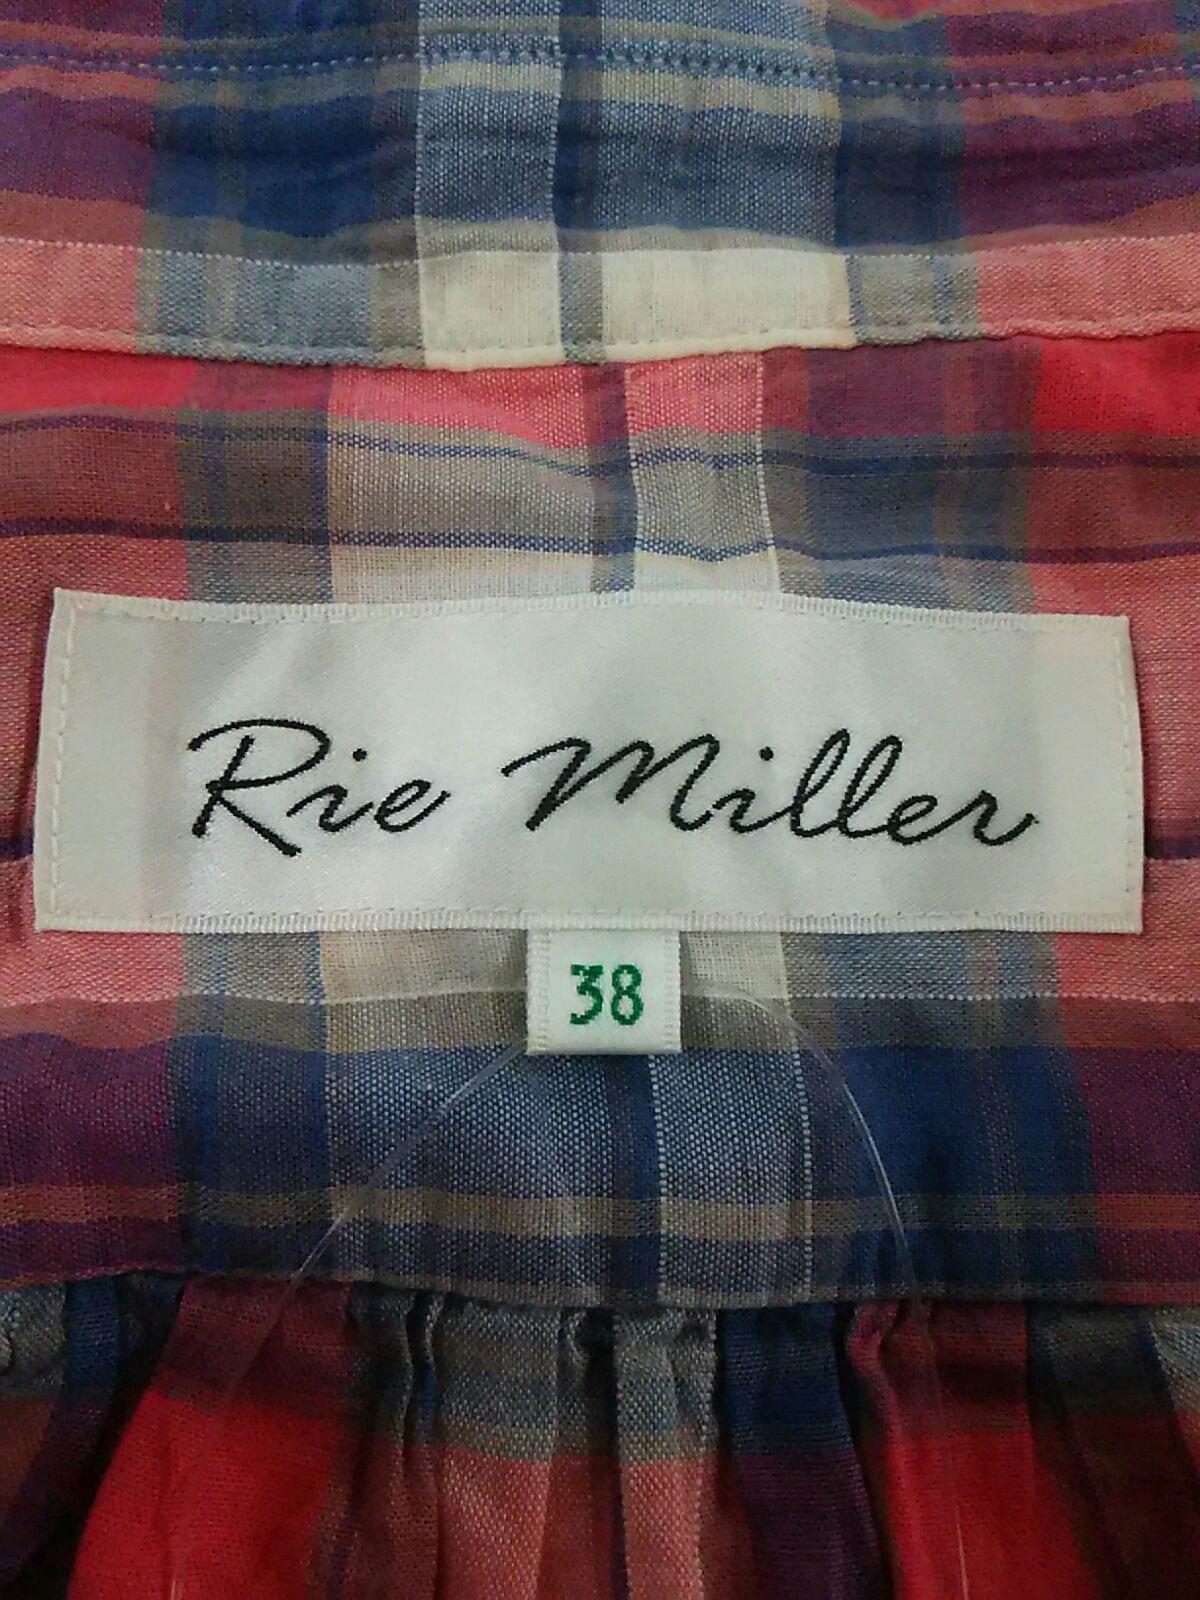 Rie Miller(リエミラー)のシャツブラウス